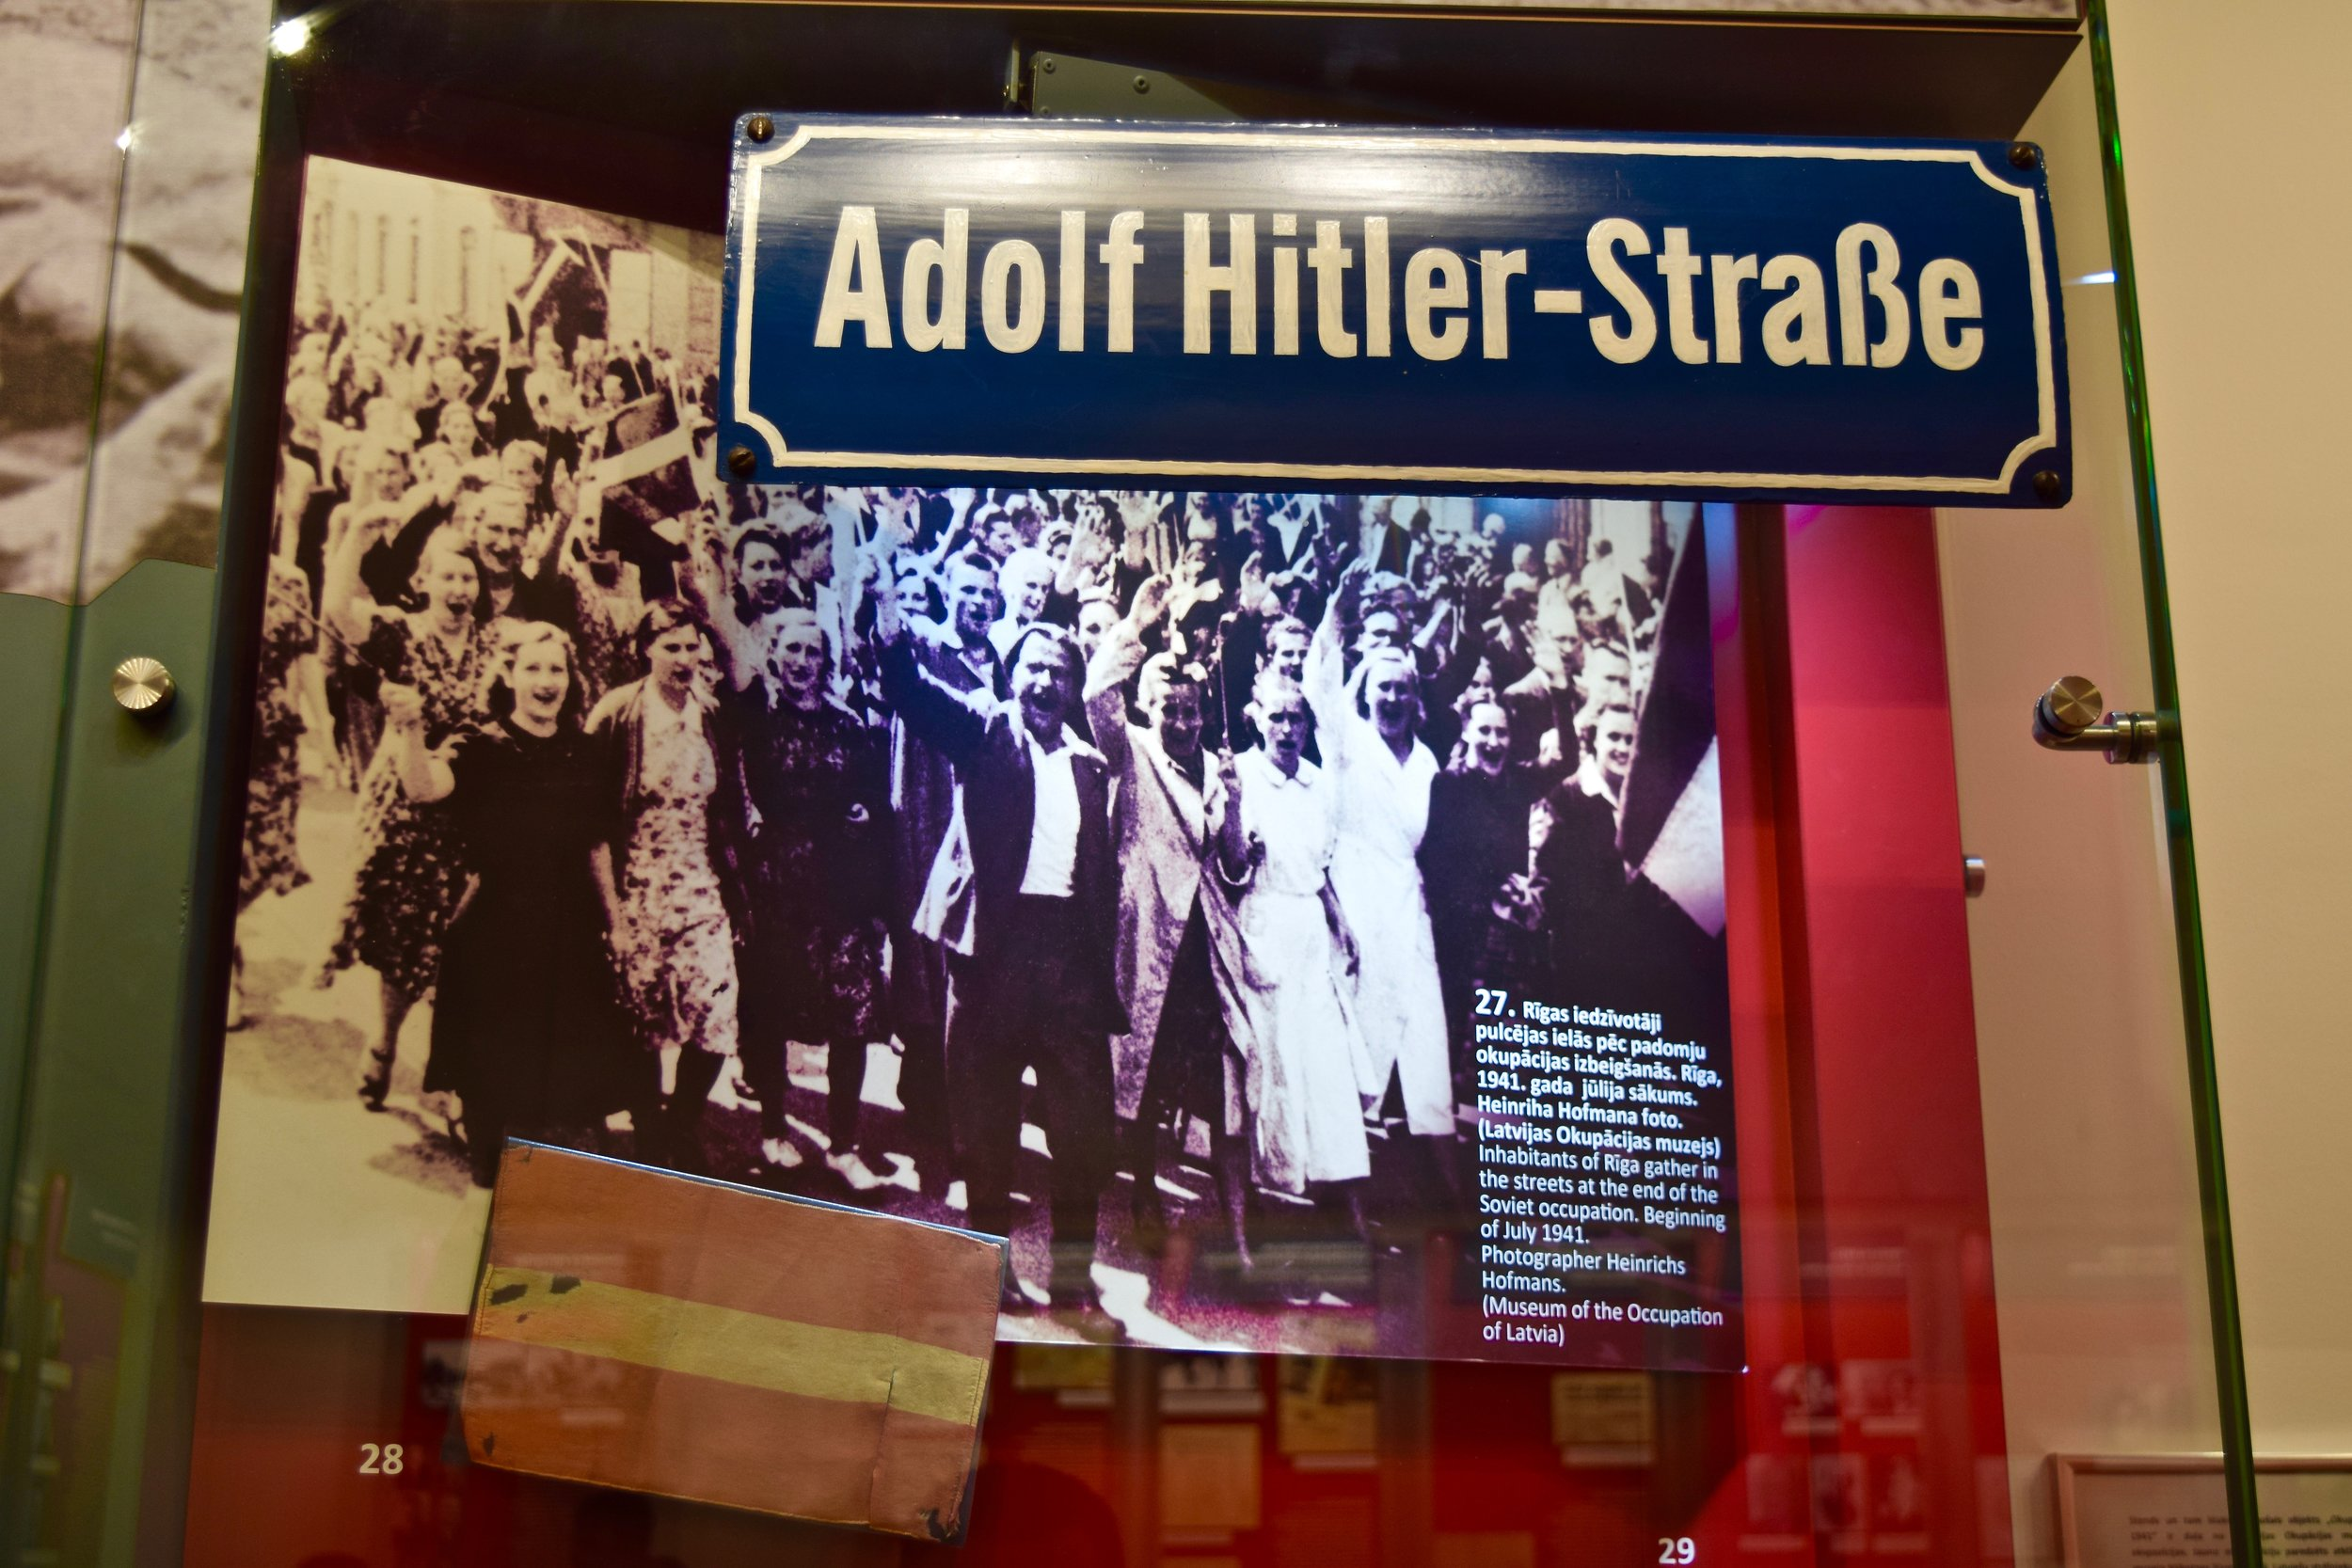 Adolf Hitler-Straße